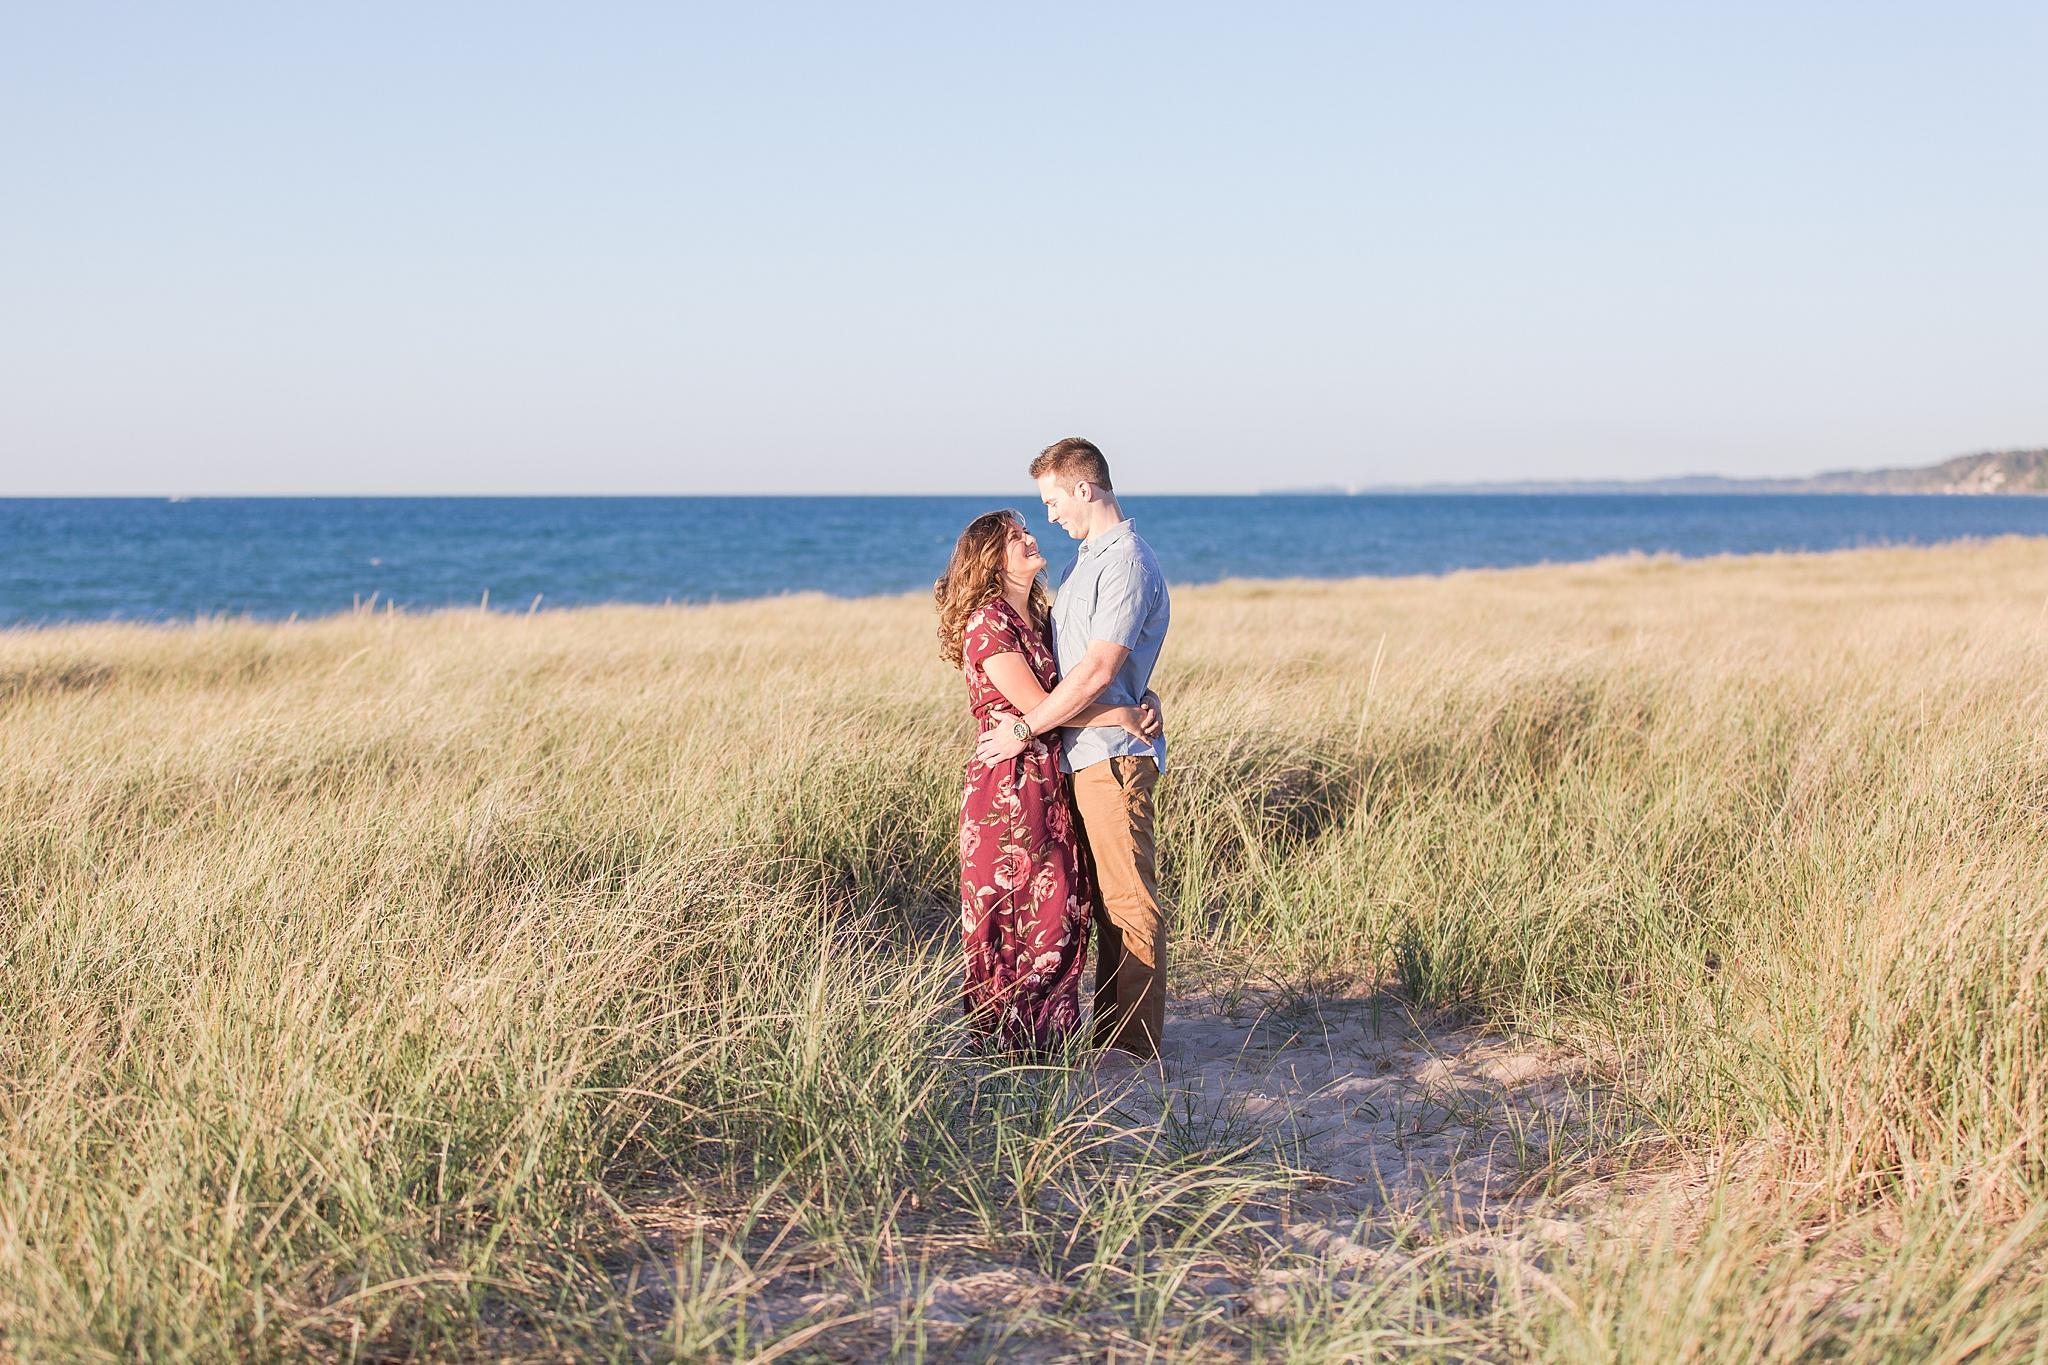 romantic--summer-beach-engagement-photography-in-st-joseph-mi-by-courtney-carolyn-photography_0010.jpg